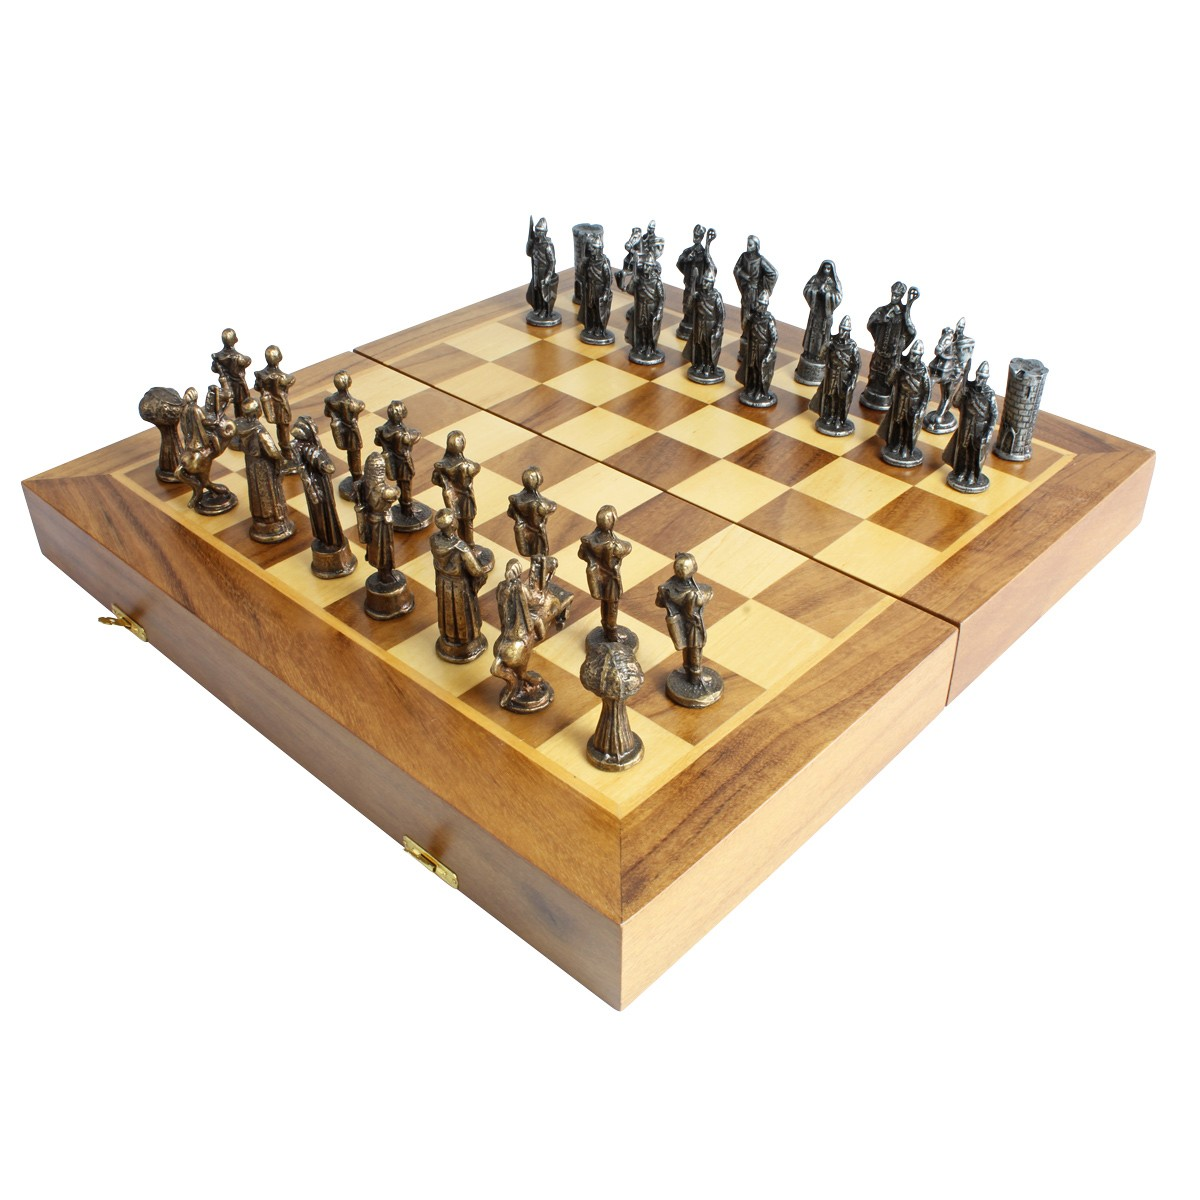 Tabuleiro de xadrez Luxo Hobin Hood vs Príncipe João I